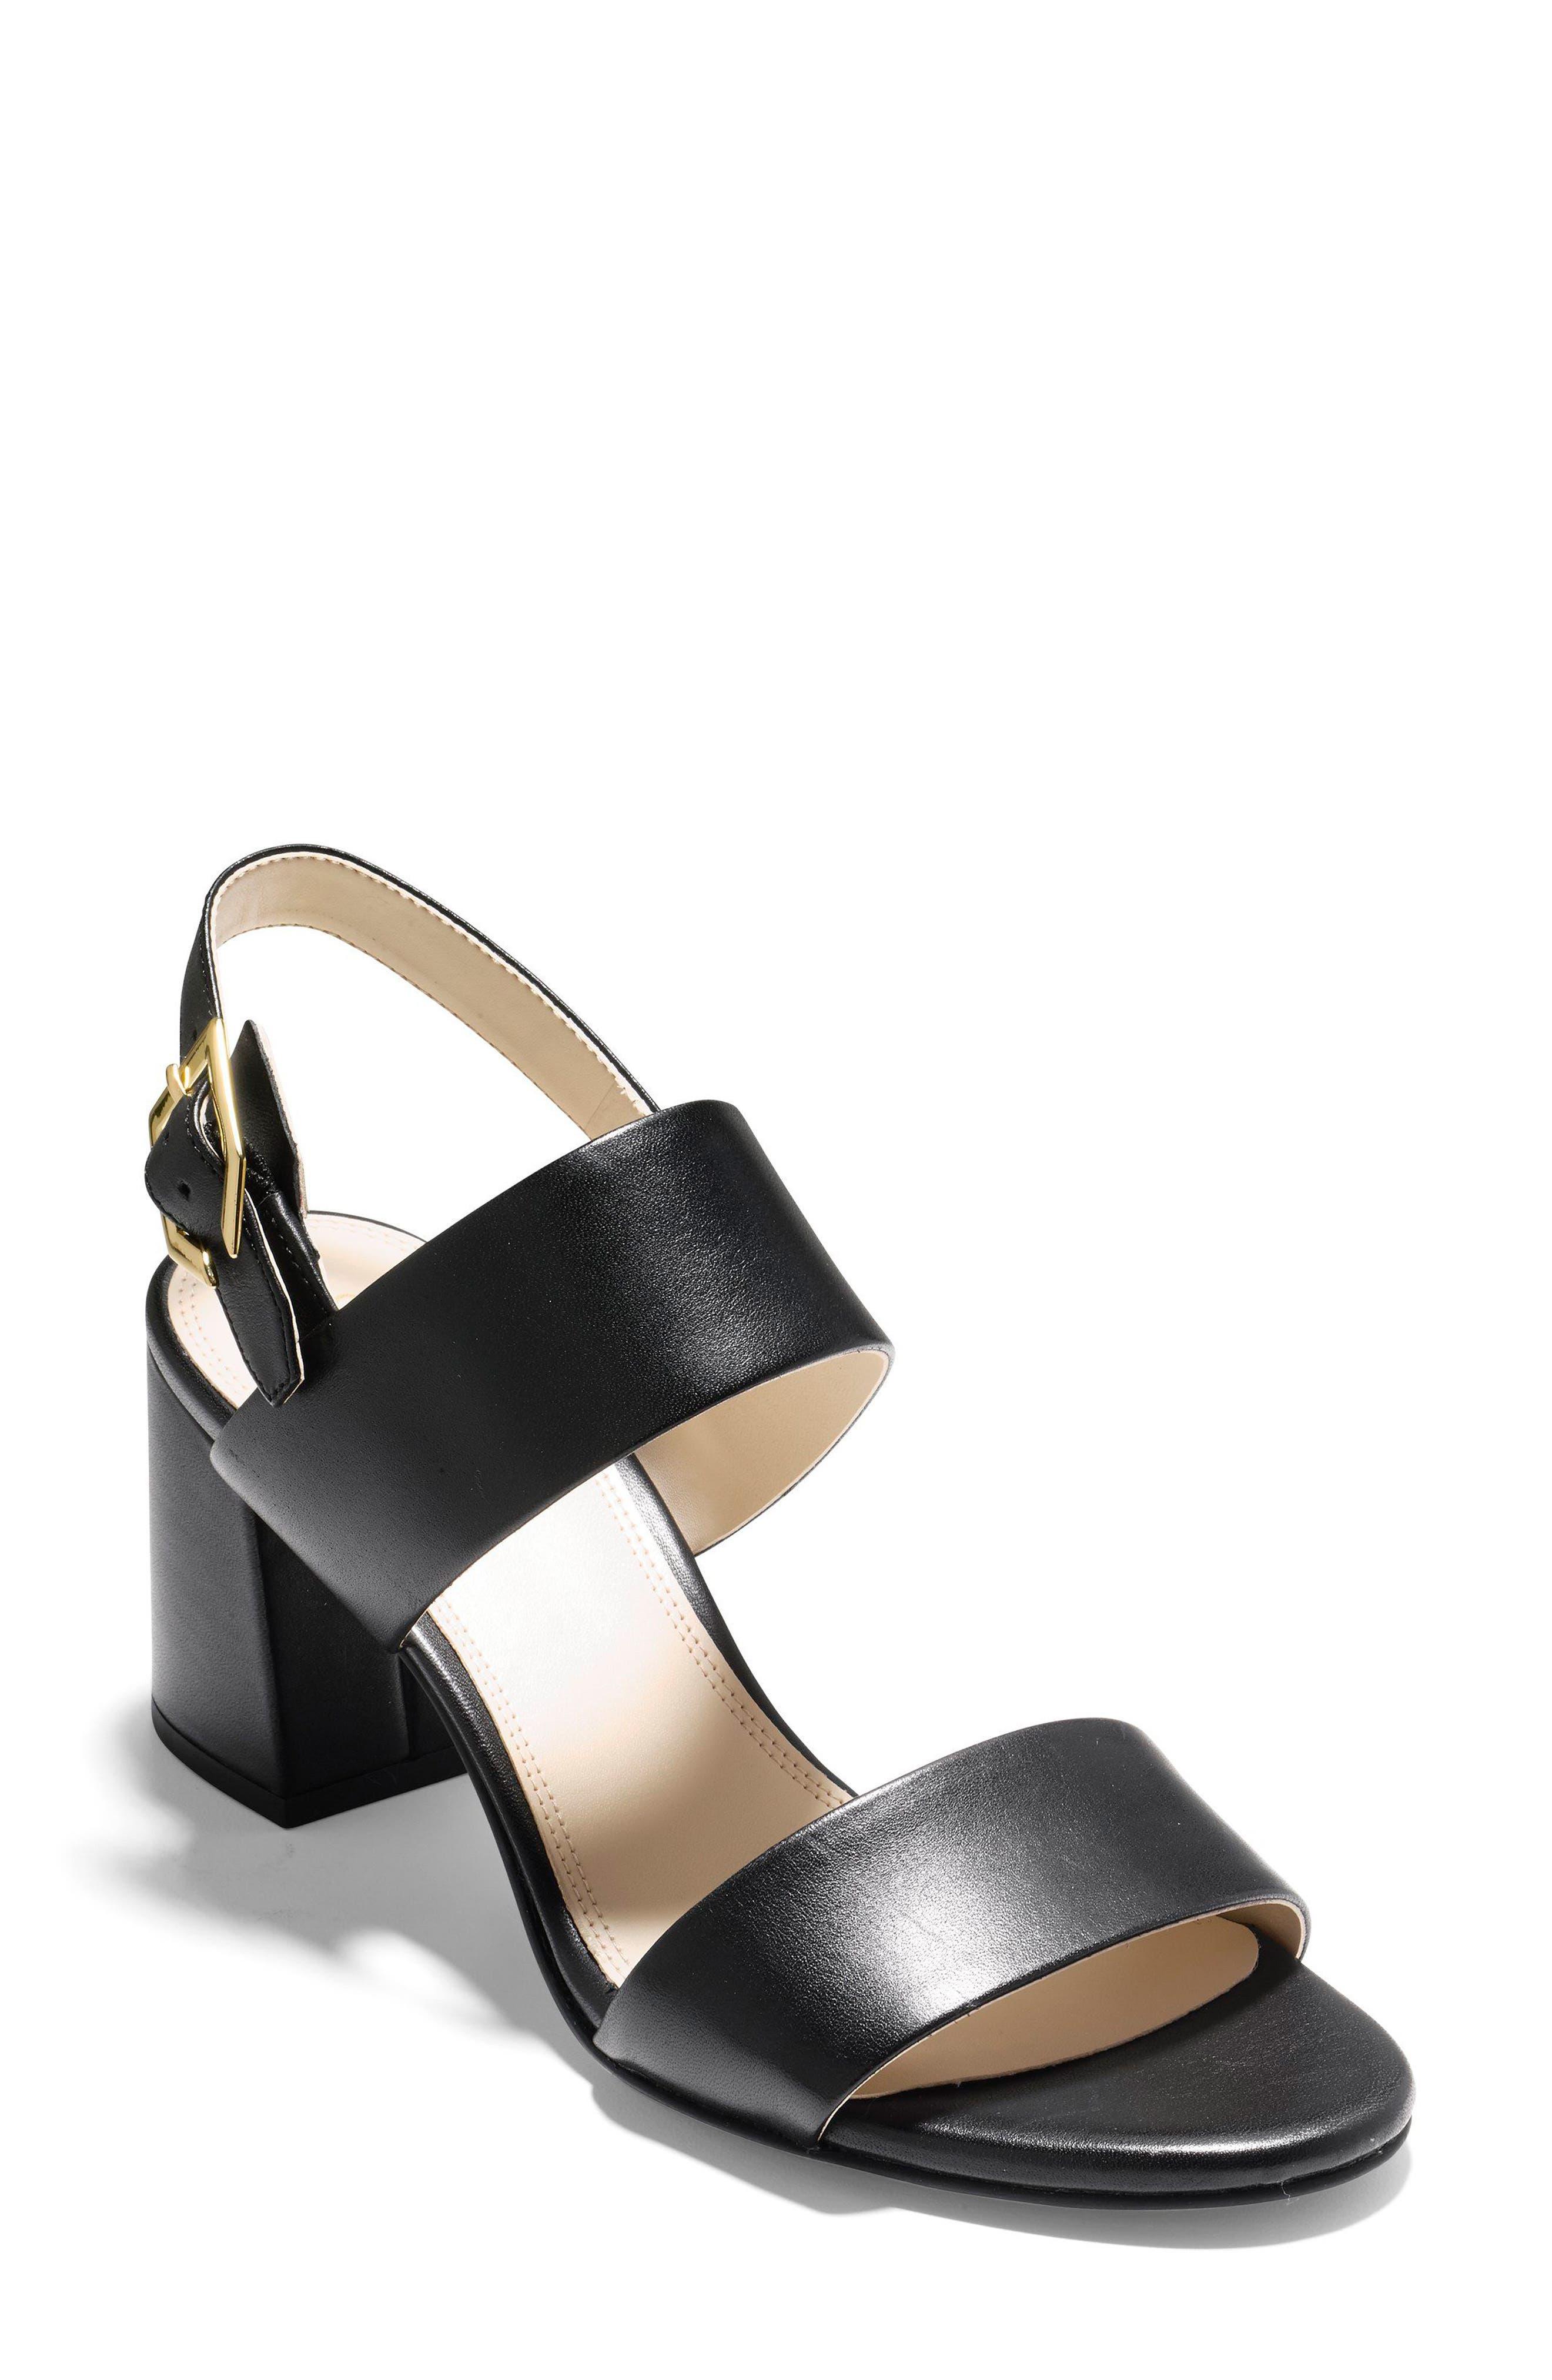 Avani Block Heel Sandal,                             Main thumbnail 1, color,                             Black Leather